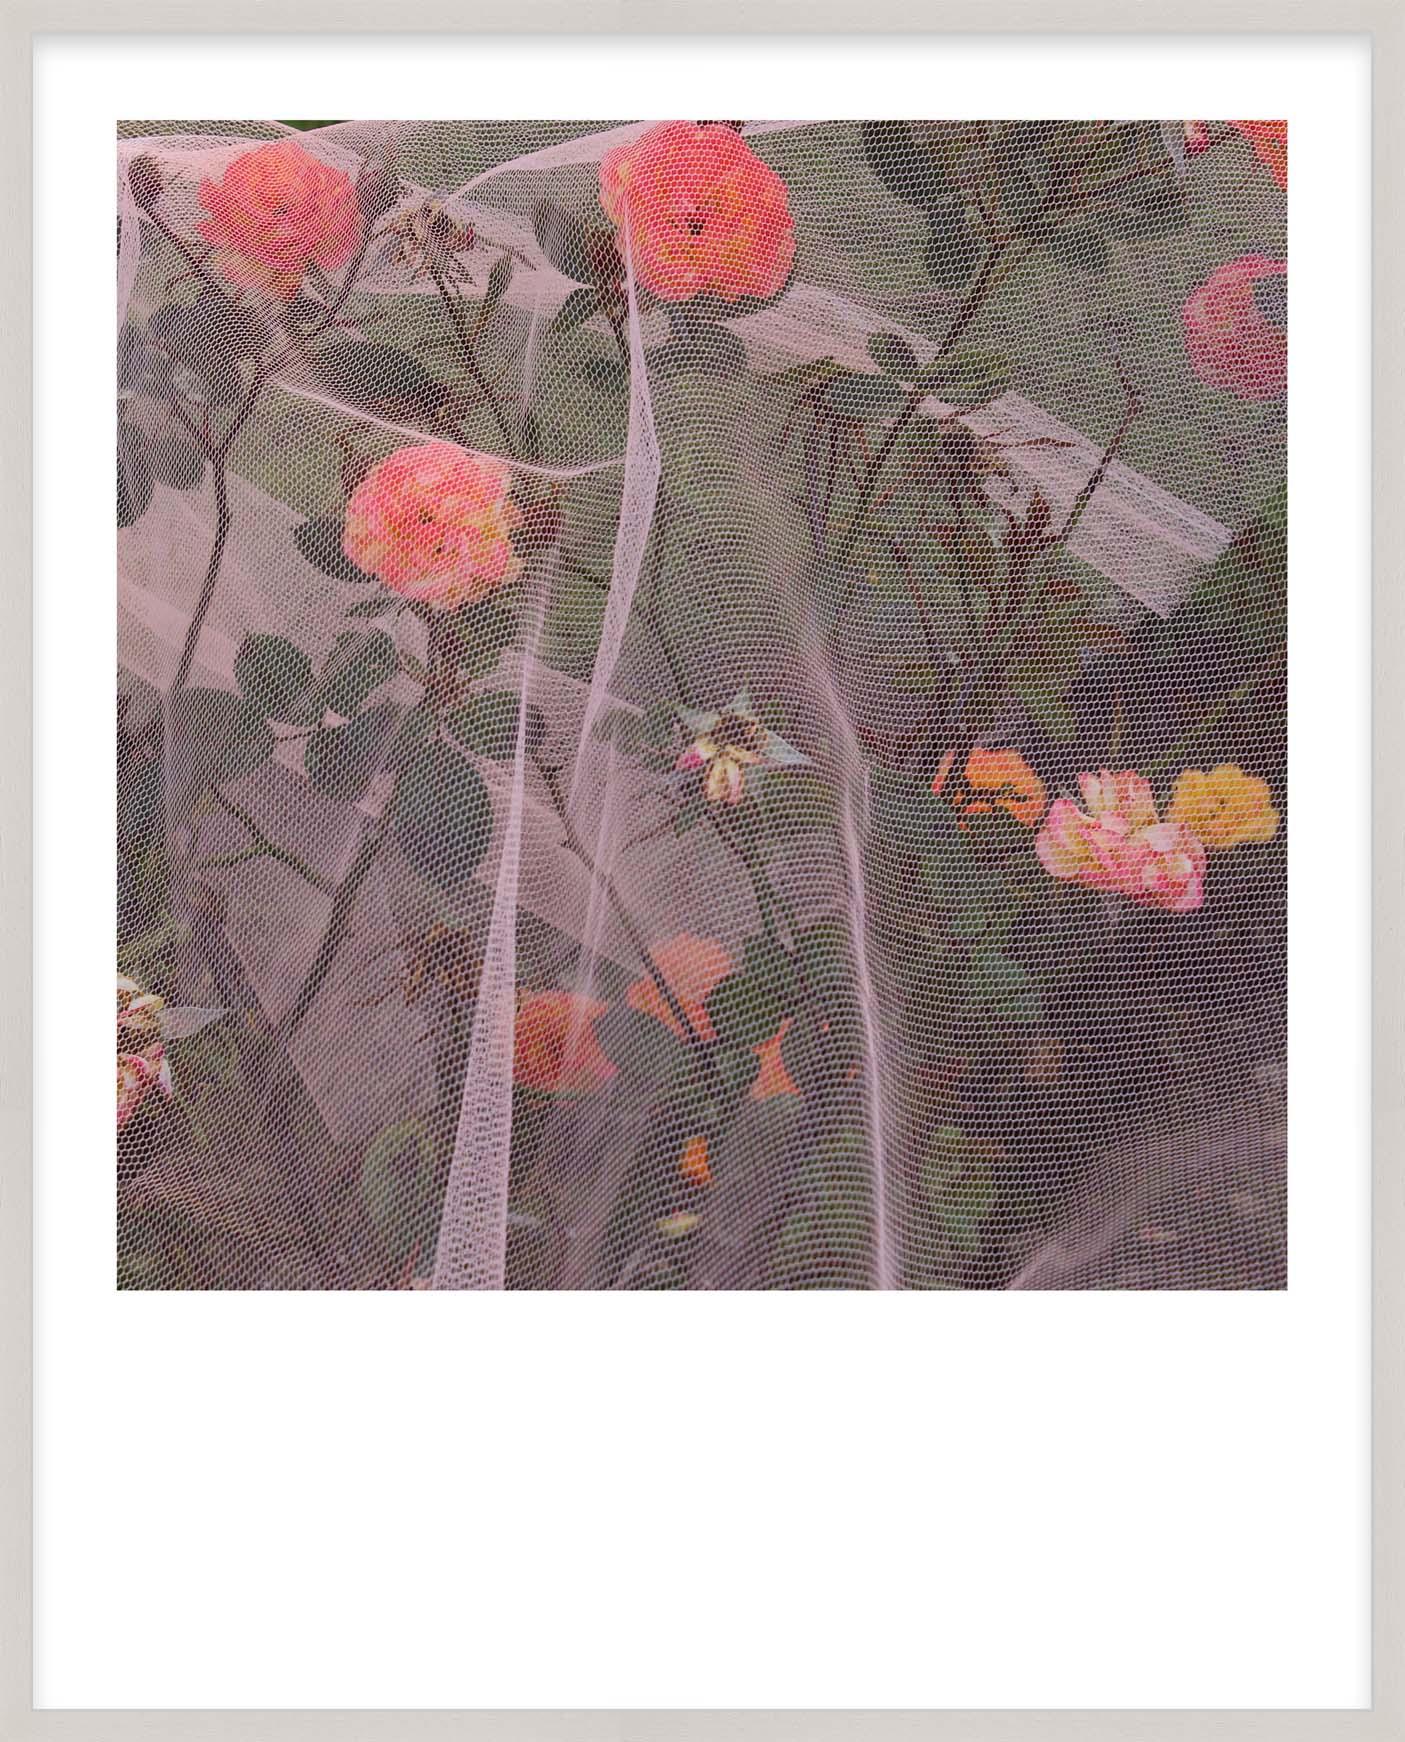 Hang Tough 'Nectarine' Slip Mounted in Limed Ayous (Framing Only)